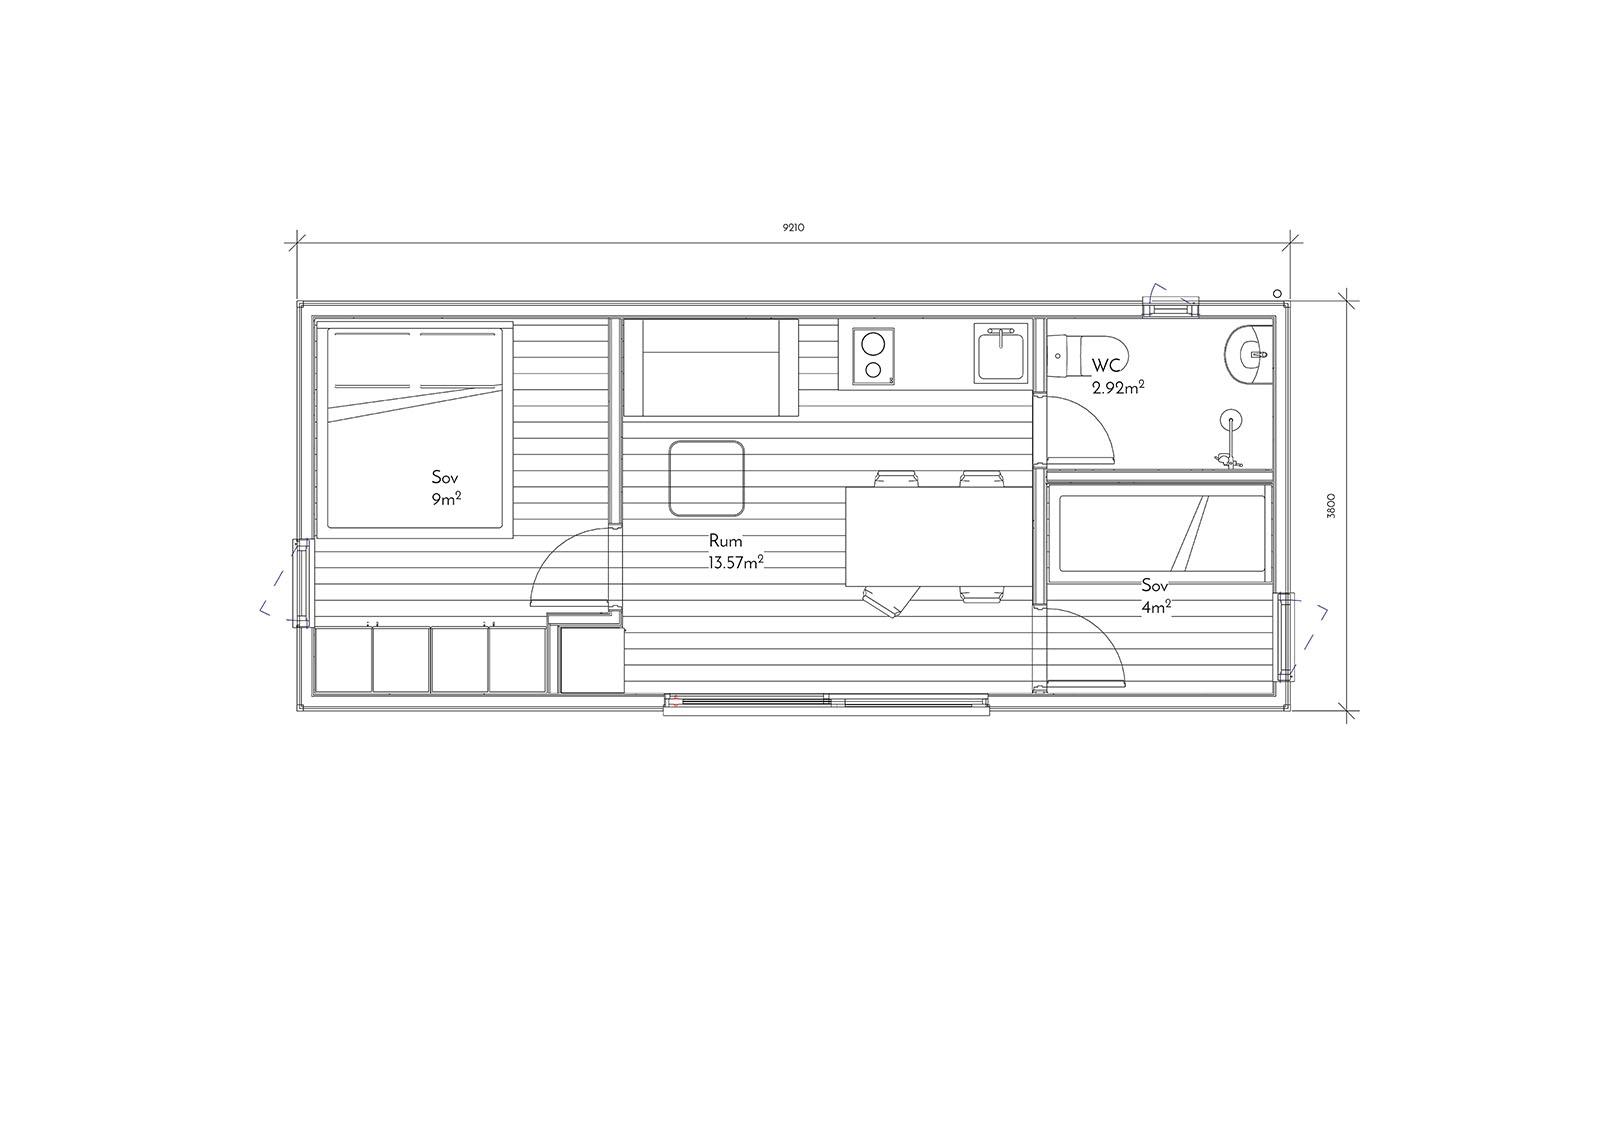 cabin-35-plan.jpg